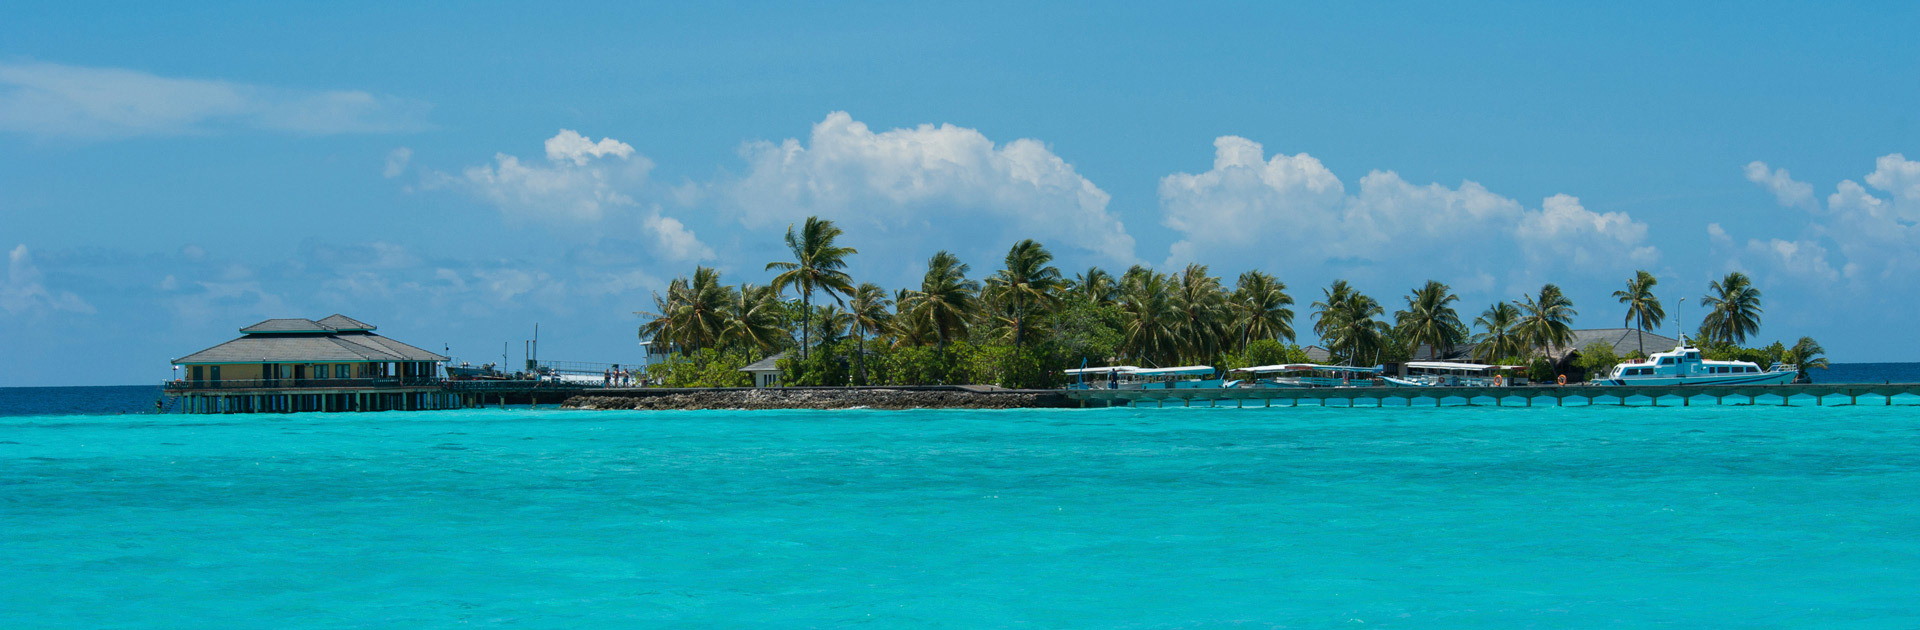 AEMV Luna de Miel Dubai y Maldivas 12 días 3